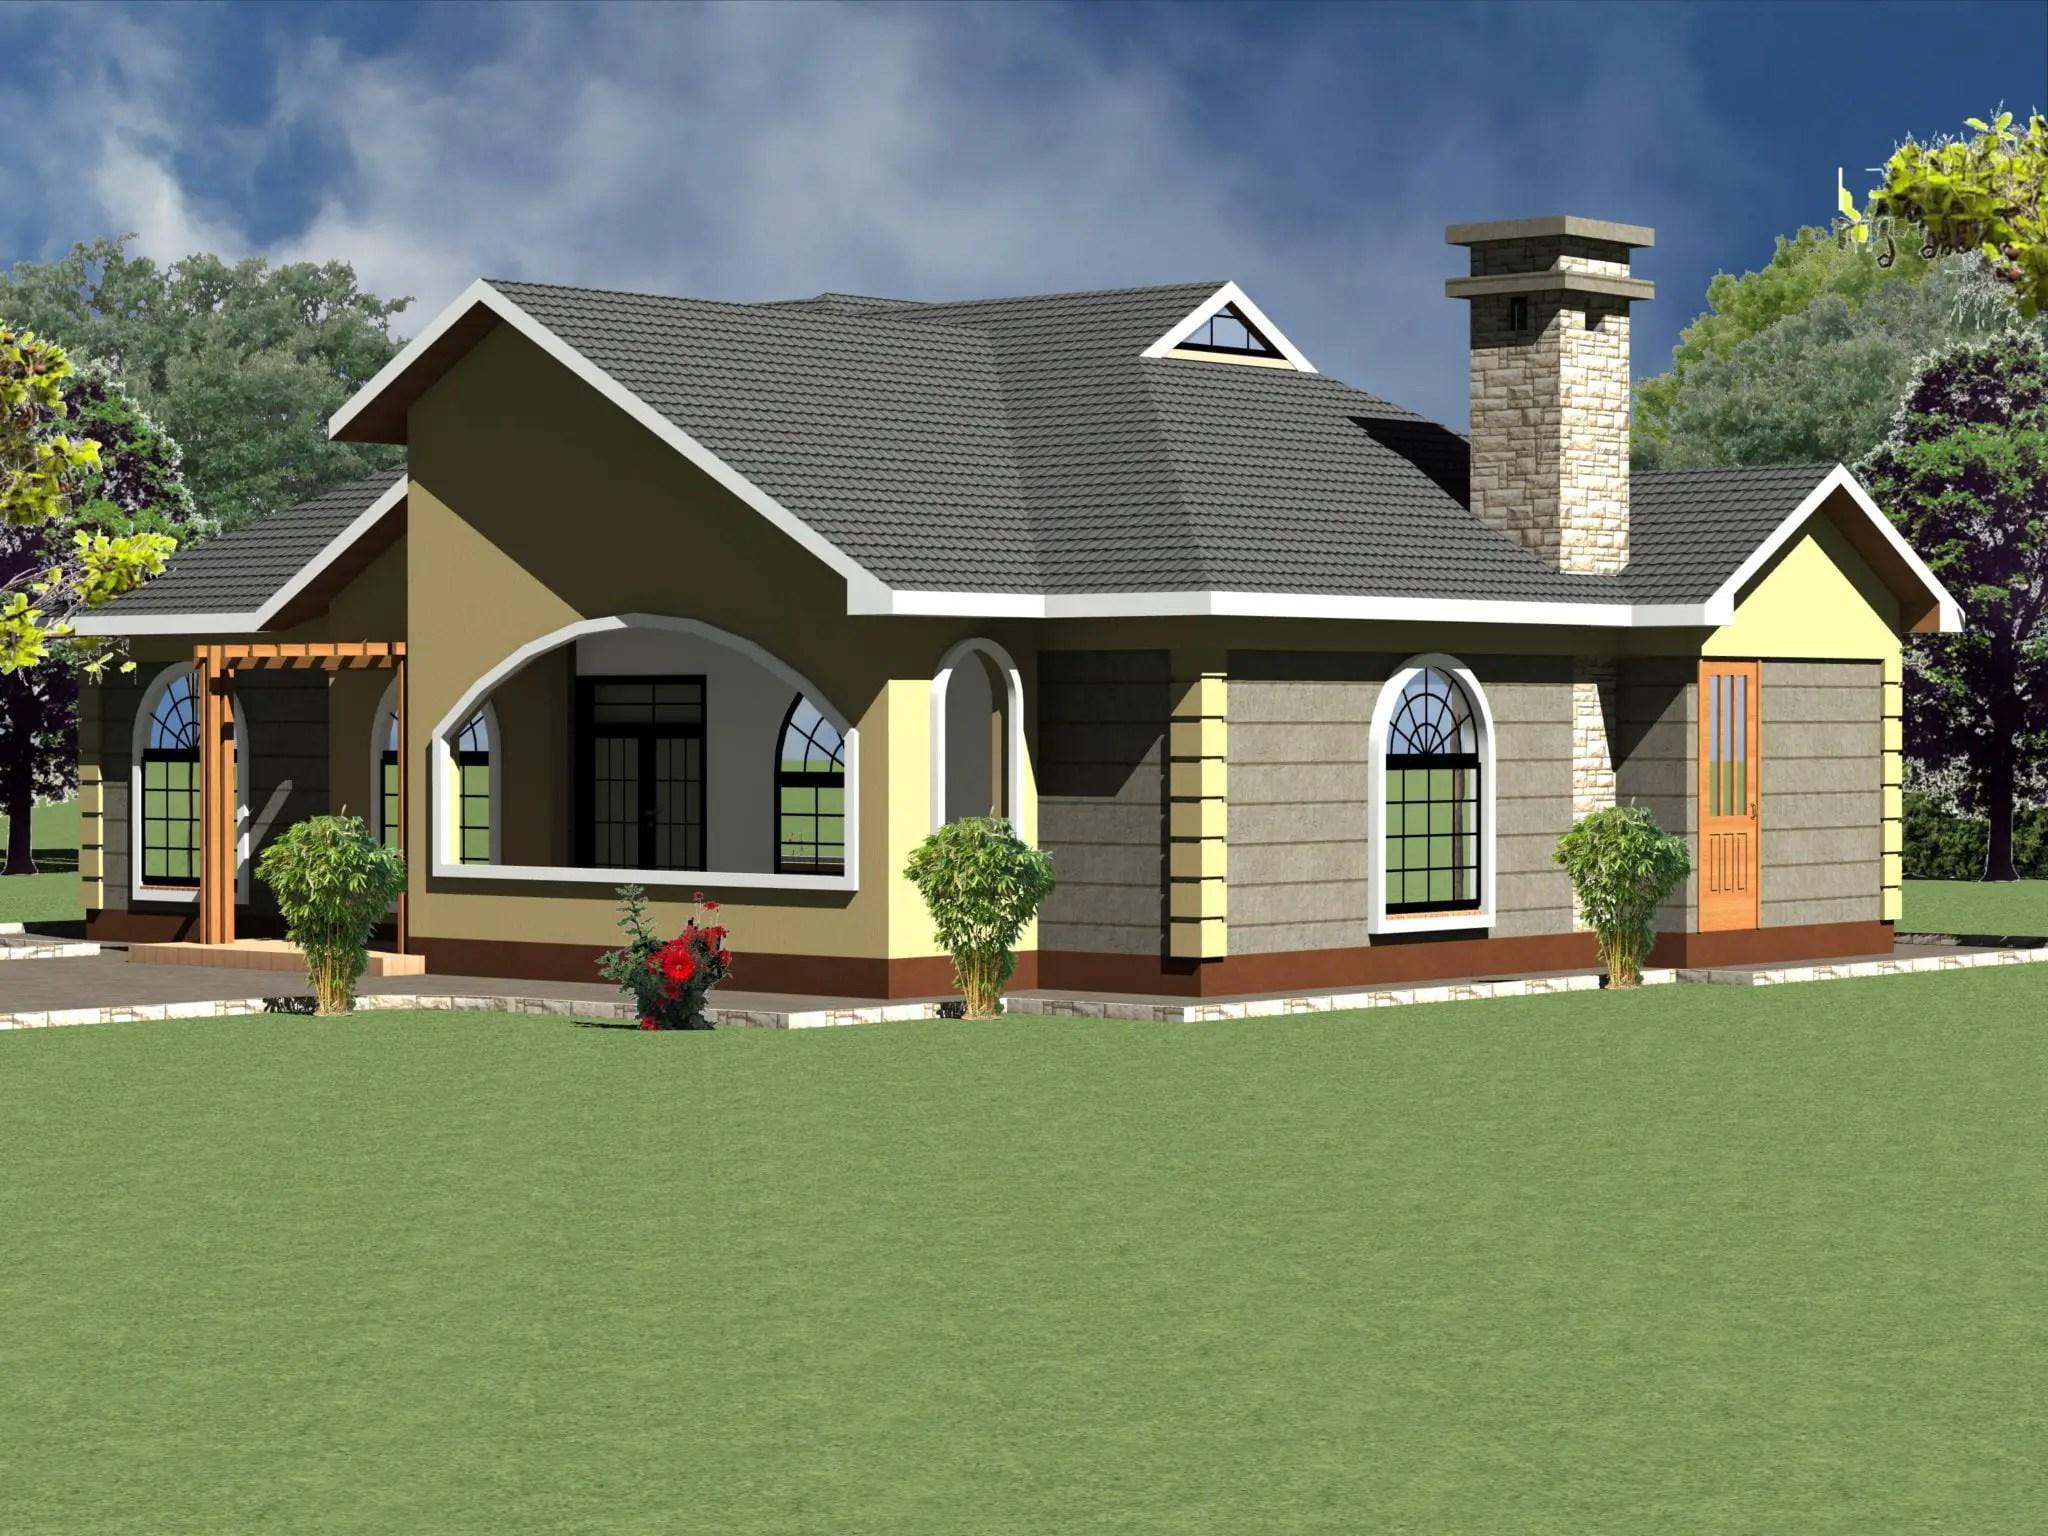 10 Bedroom Modern House Plans And Designs - Novocom.top